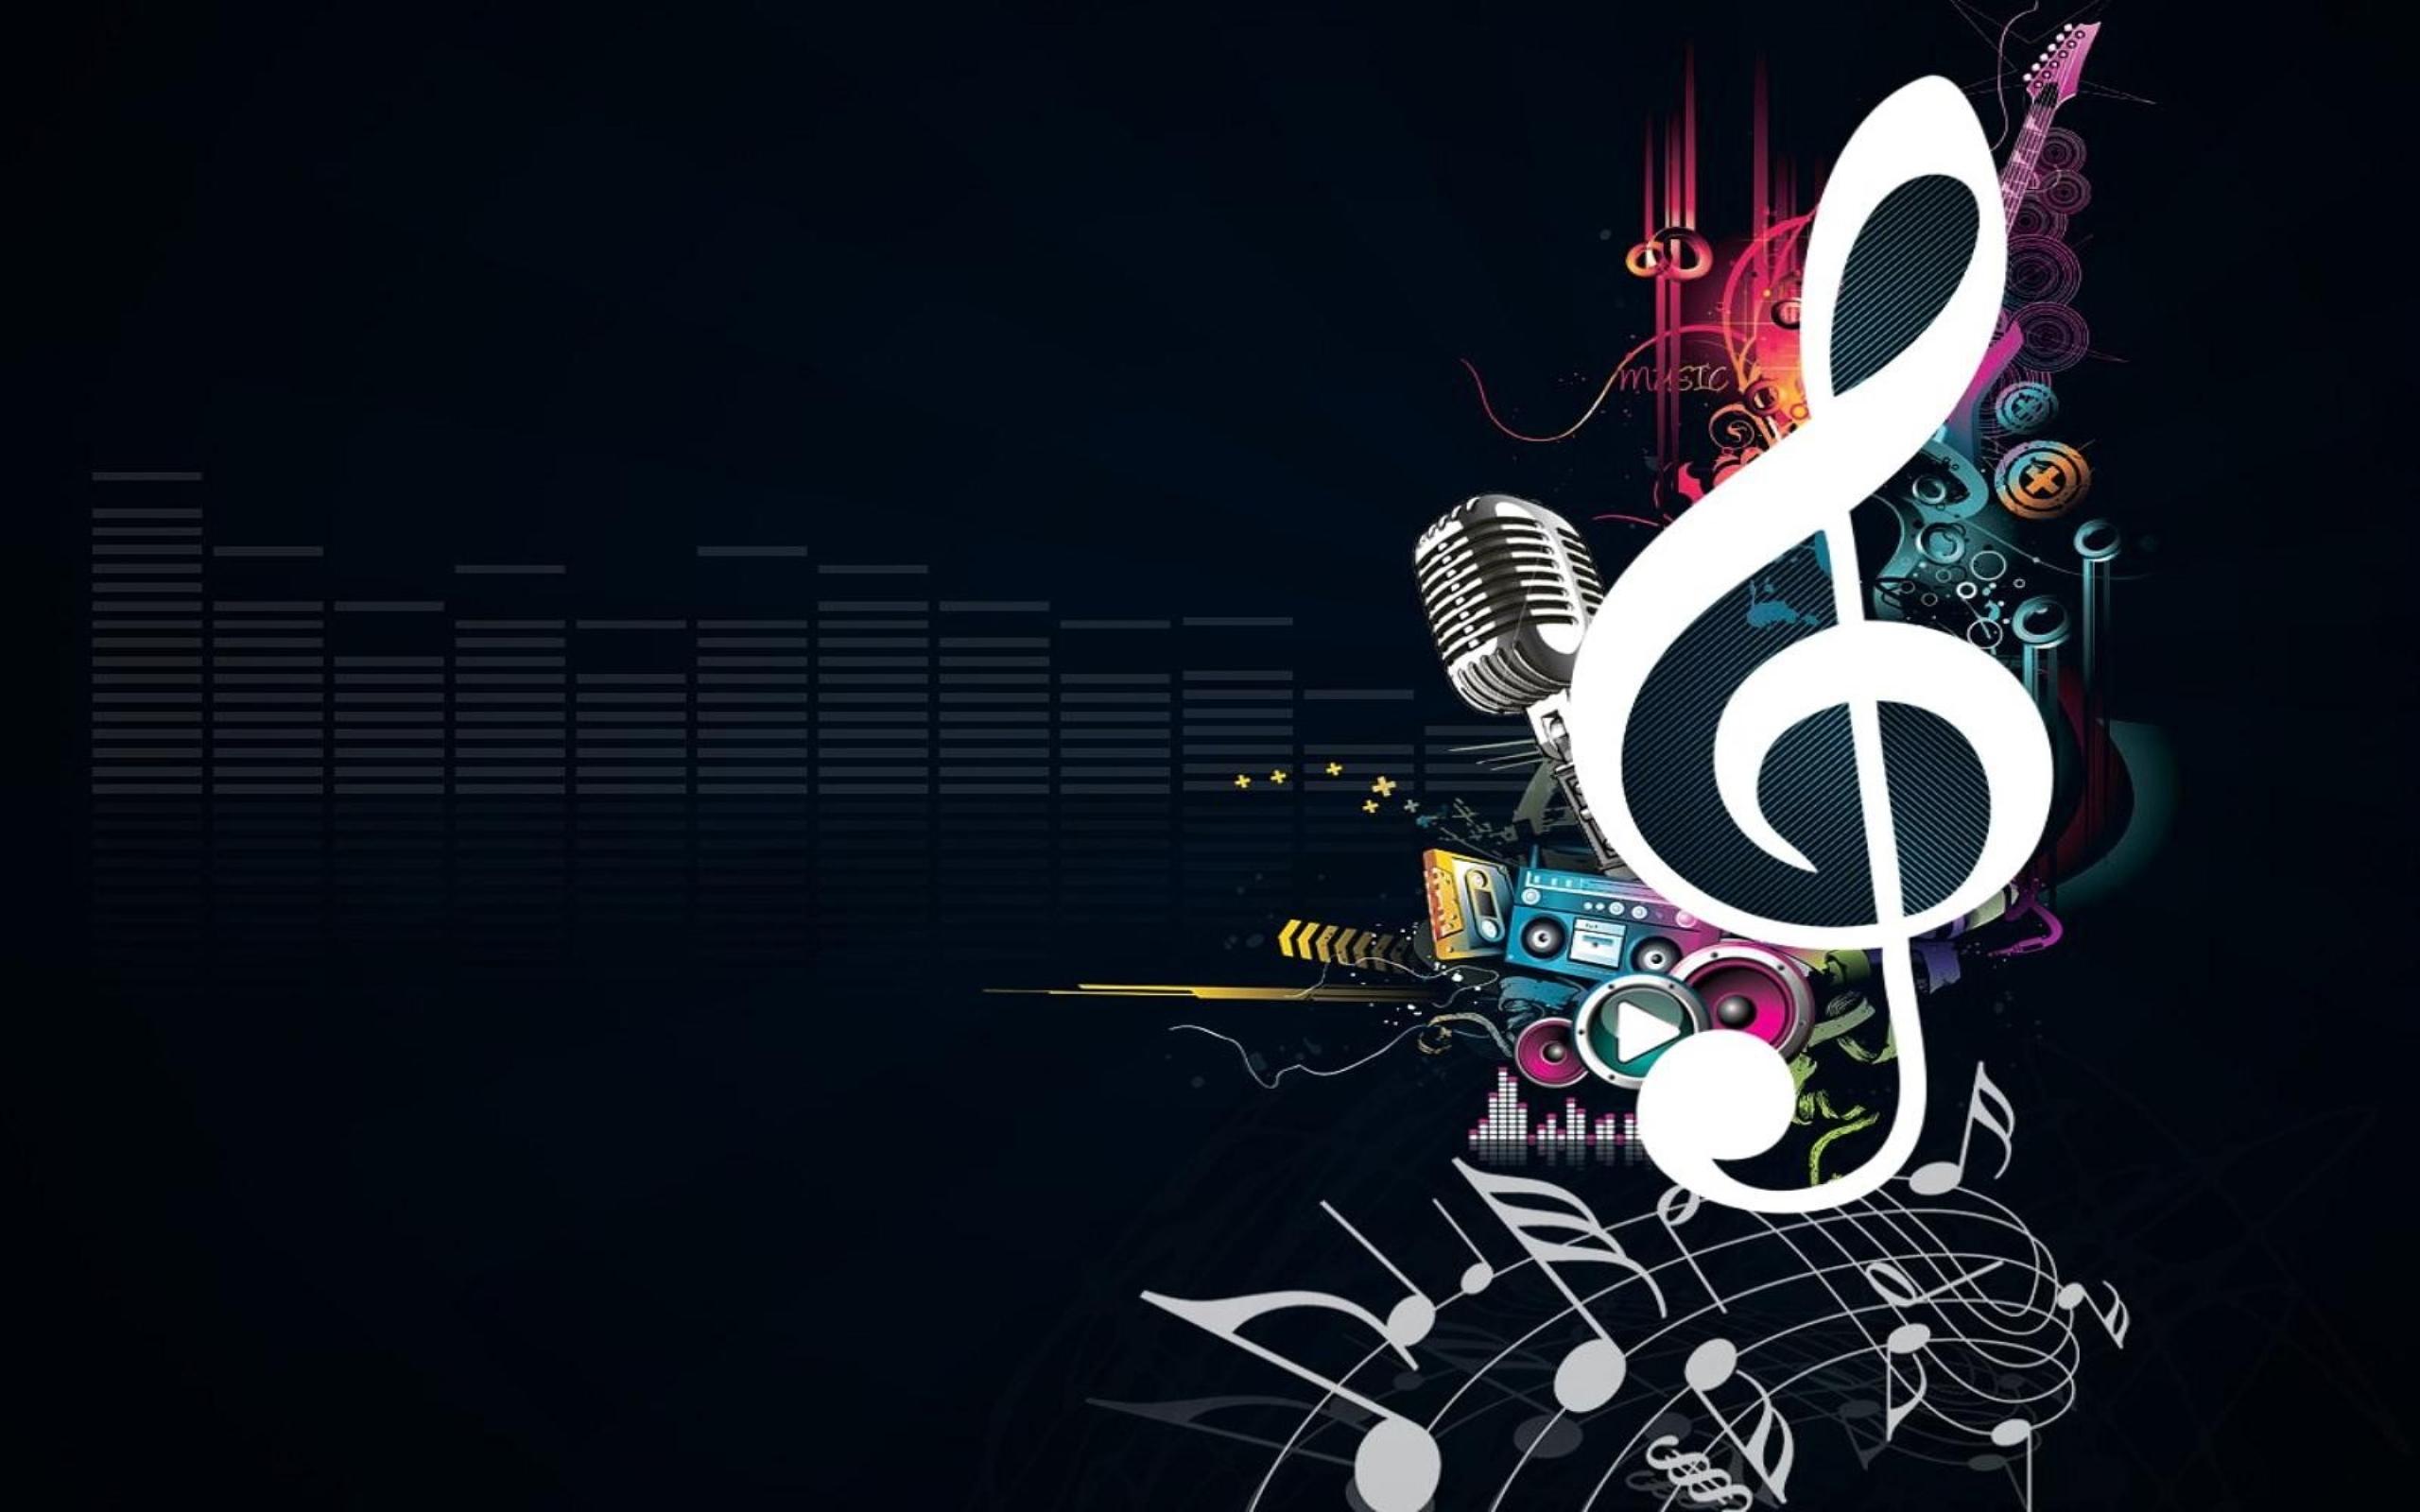 Cool Art Music Wallpaper Download Free Hd Wallpapers